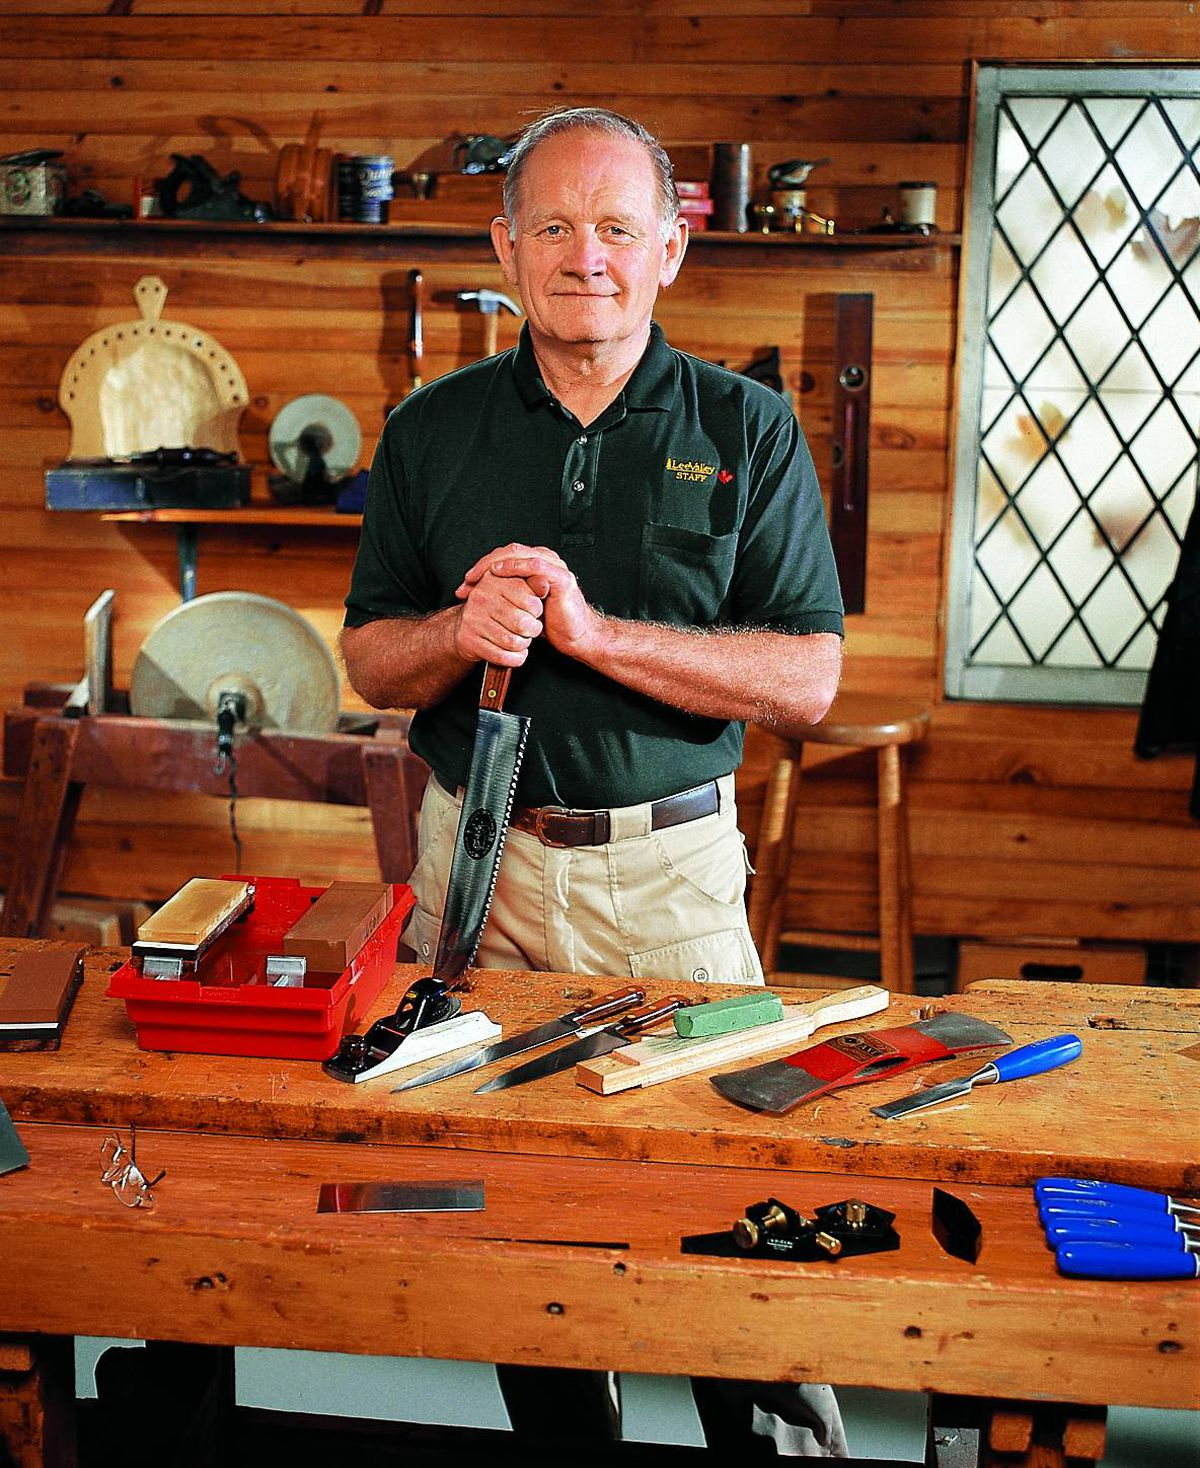 Lee Valley Tools Founder Leonard Lee Treated Customers As Friends